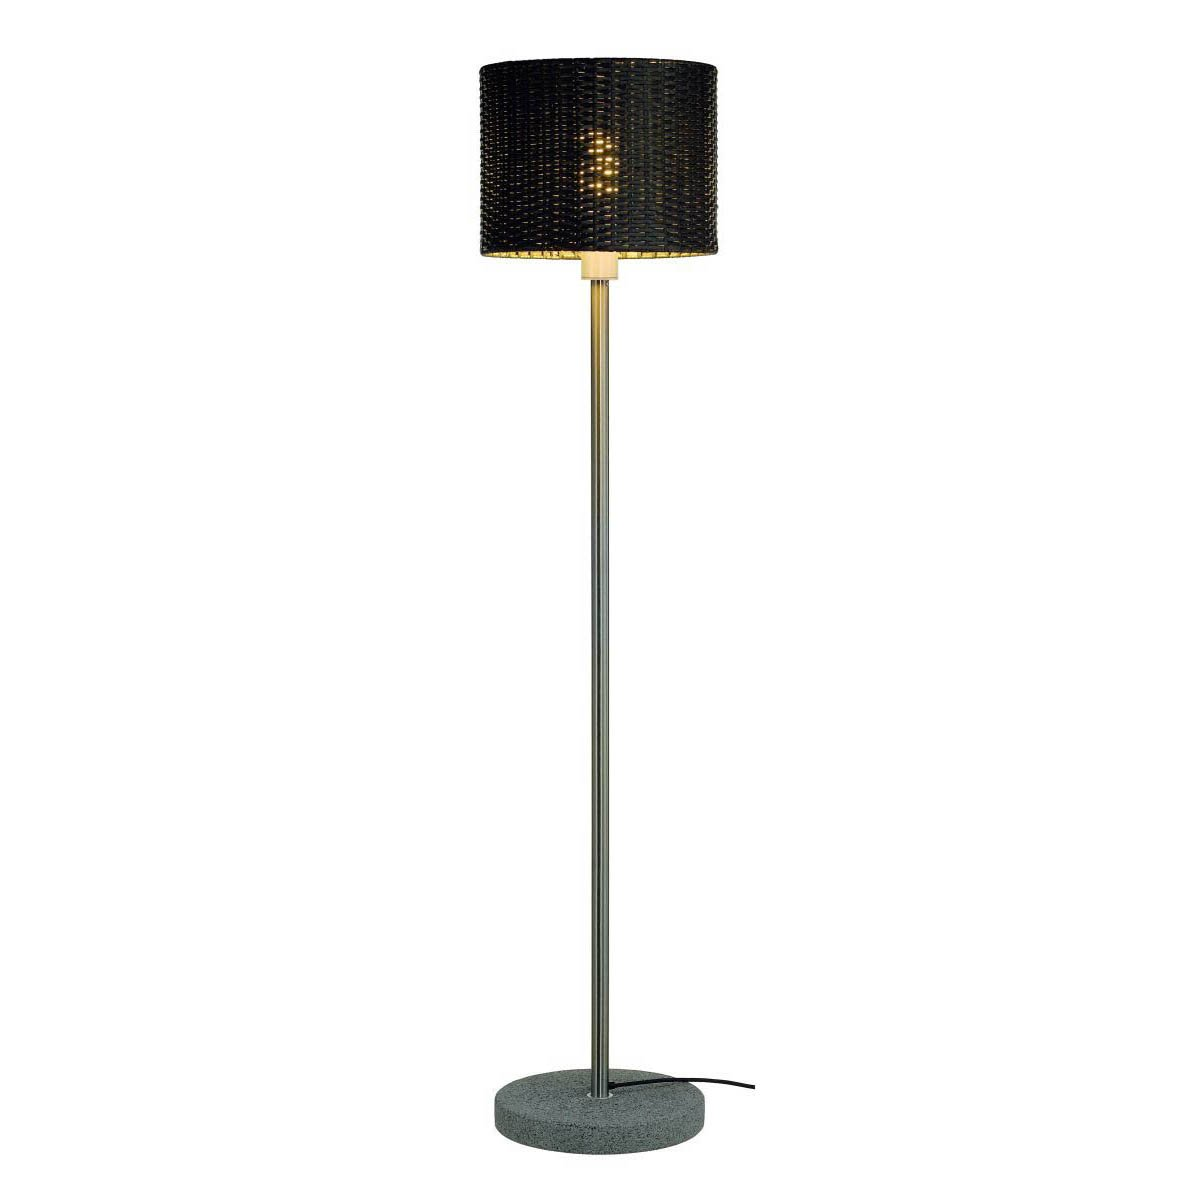 SLV Lighting 231395U Adegan Manila Sl Outdoor Floor Lamp, Stainless Steel/Anthracite